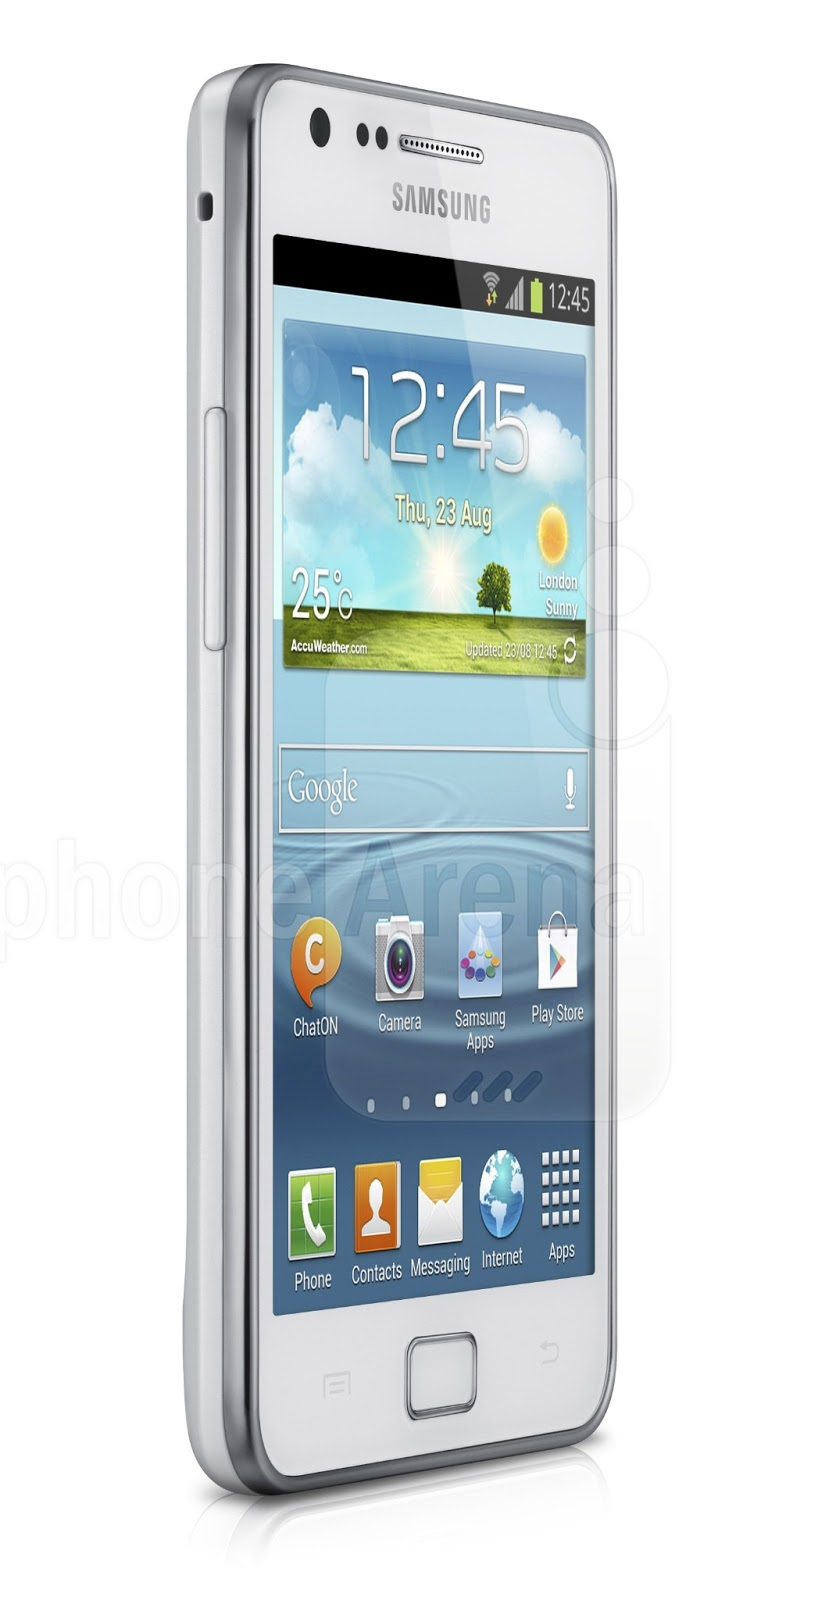 Samsung released new smartphone in Taiwan | GadgetCongress